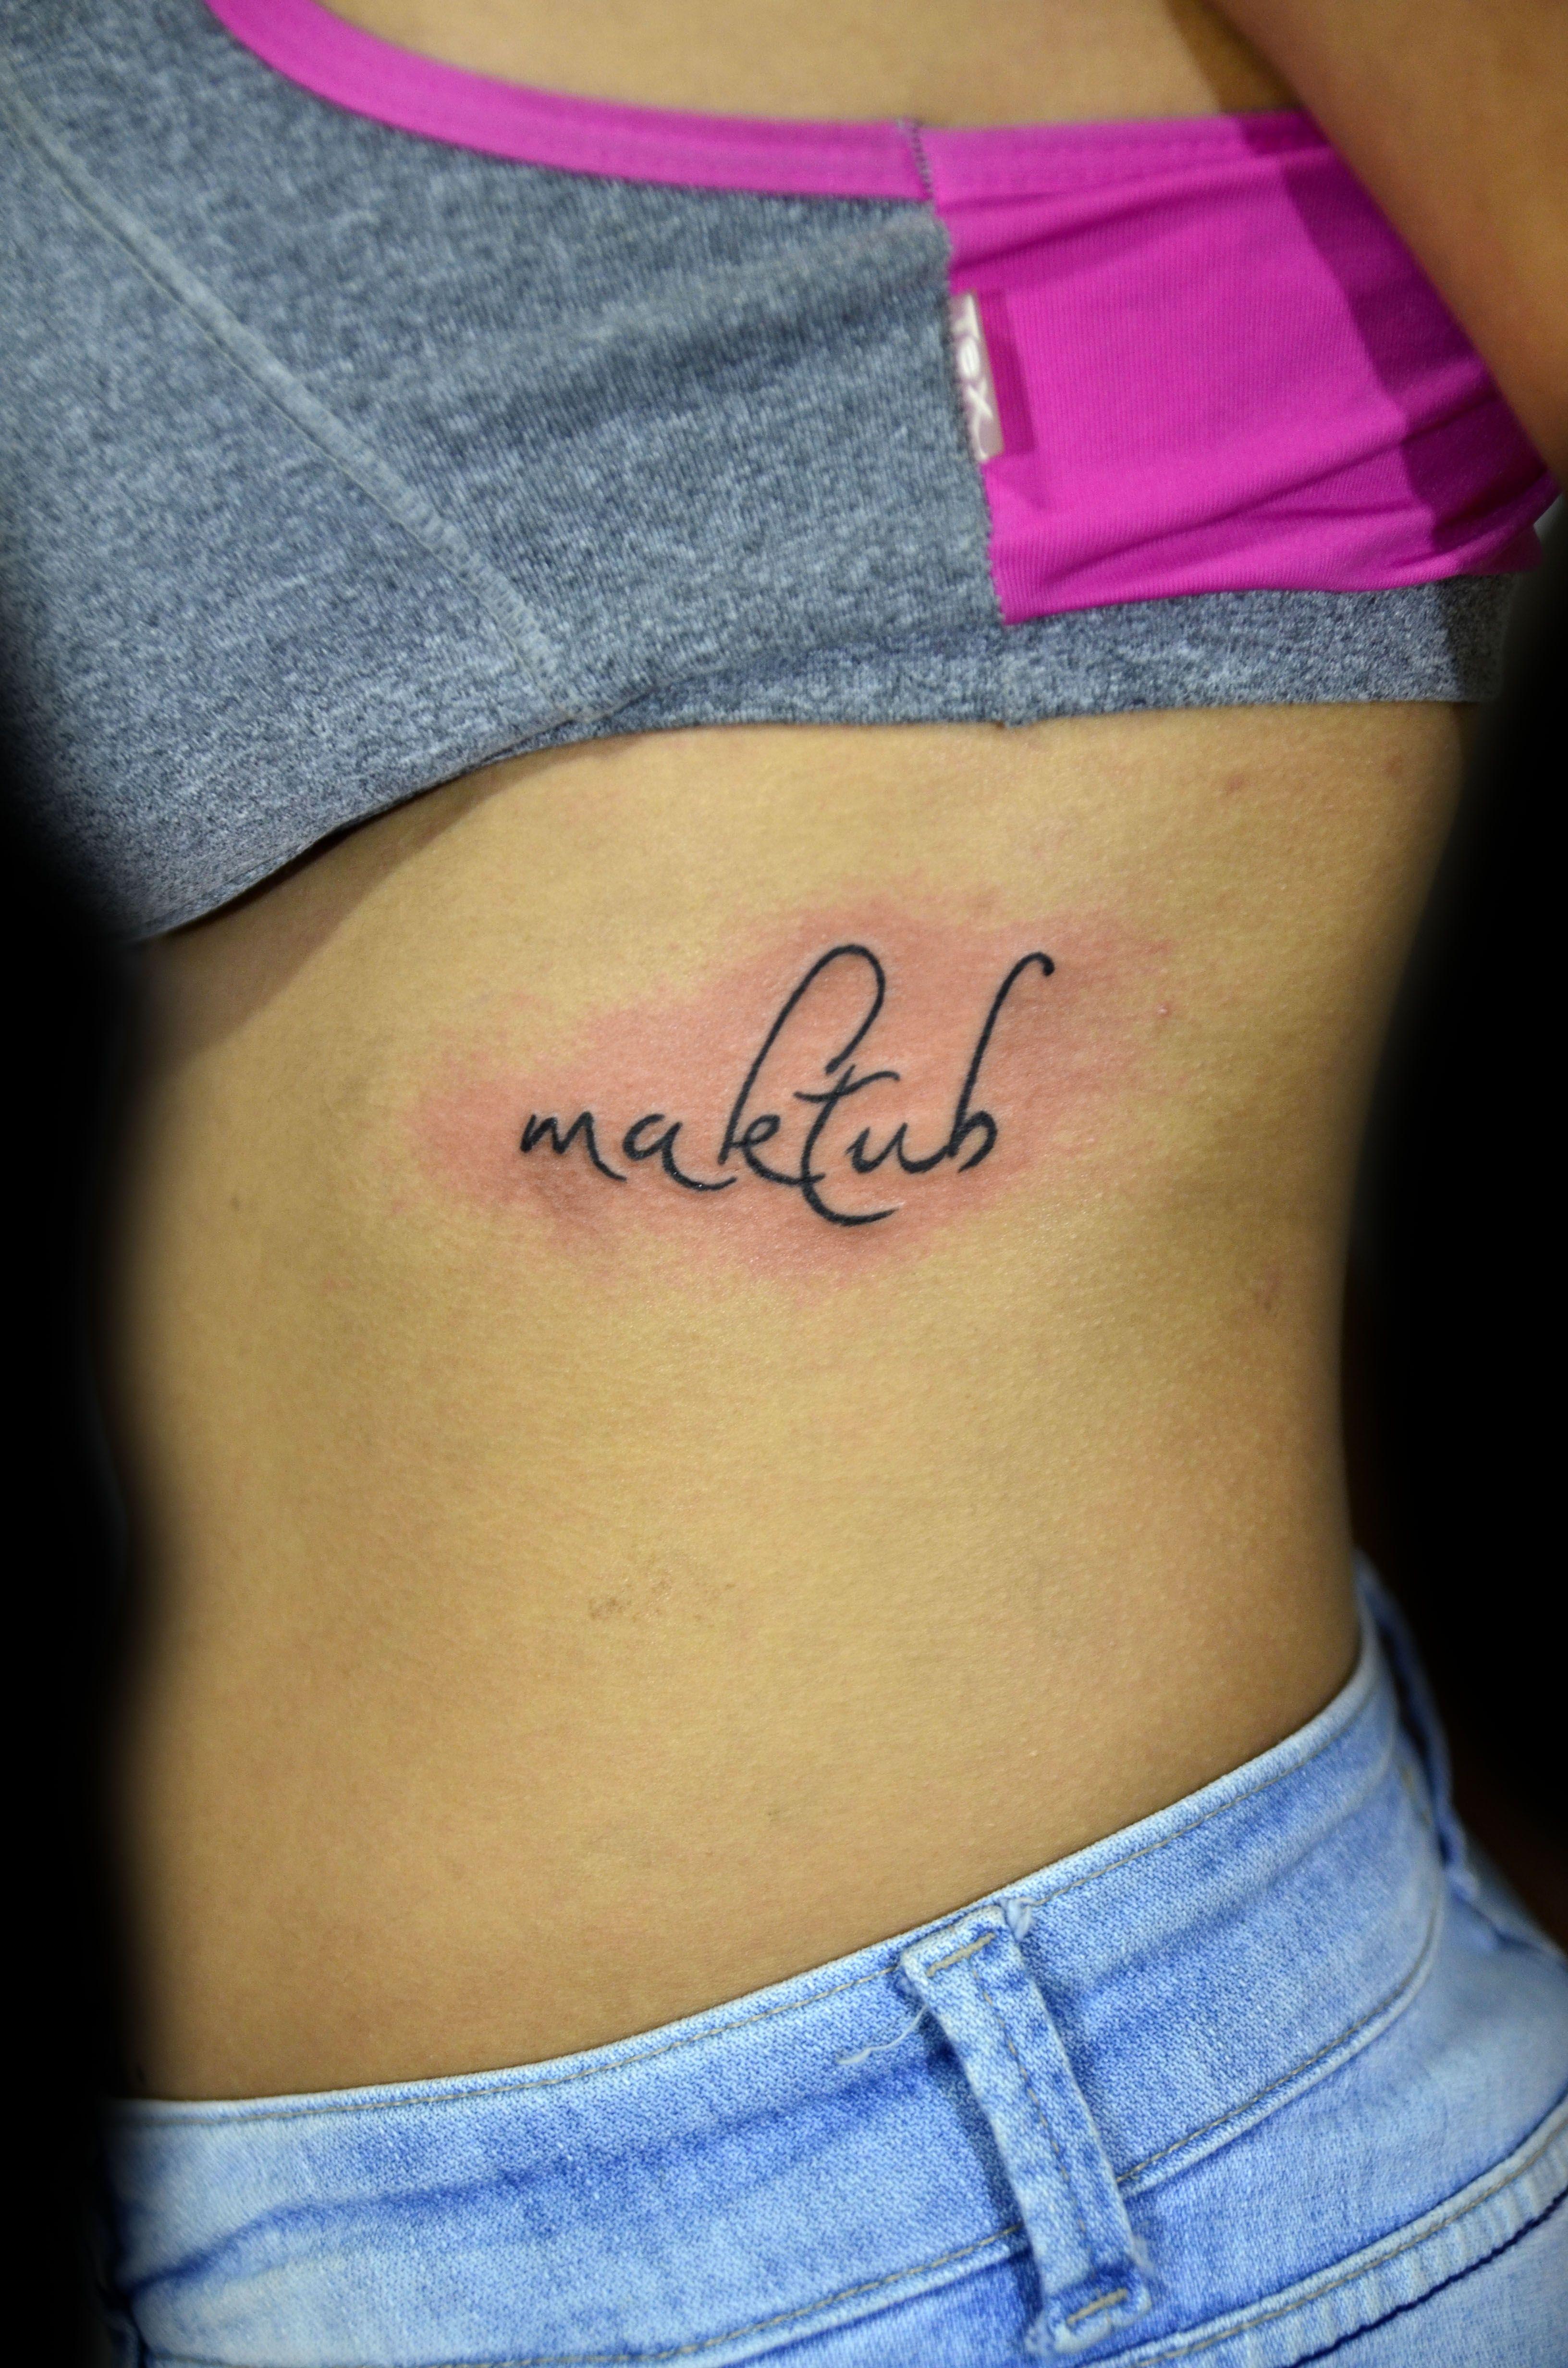 Maktub Tatuaje Eugenia Suarez Sfb